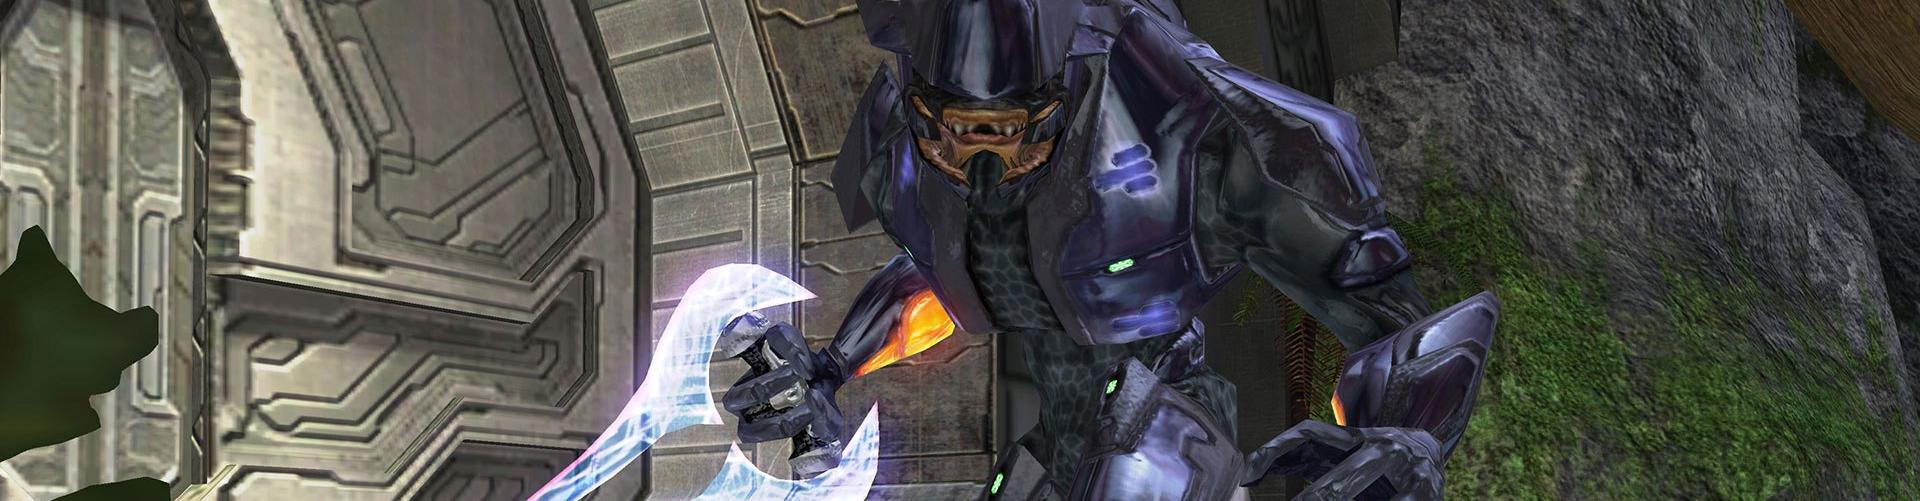 video games sacred icon rh sacredicon blog